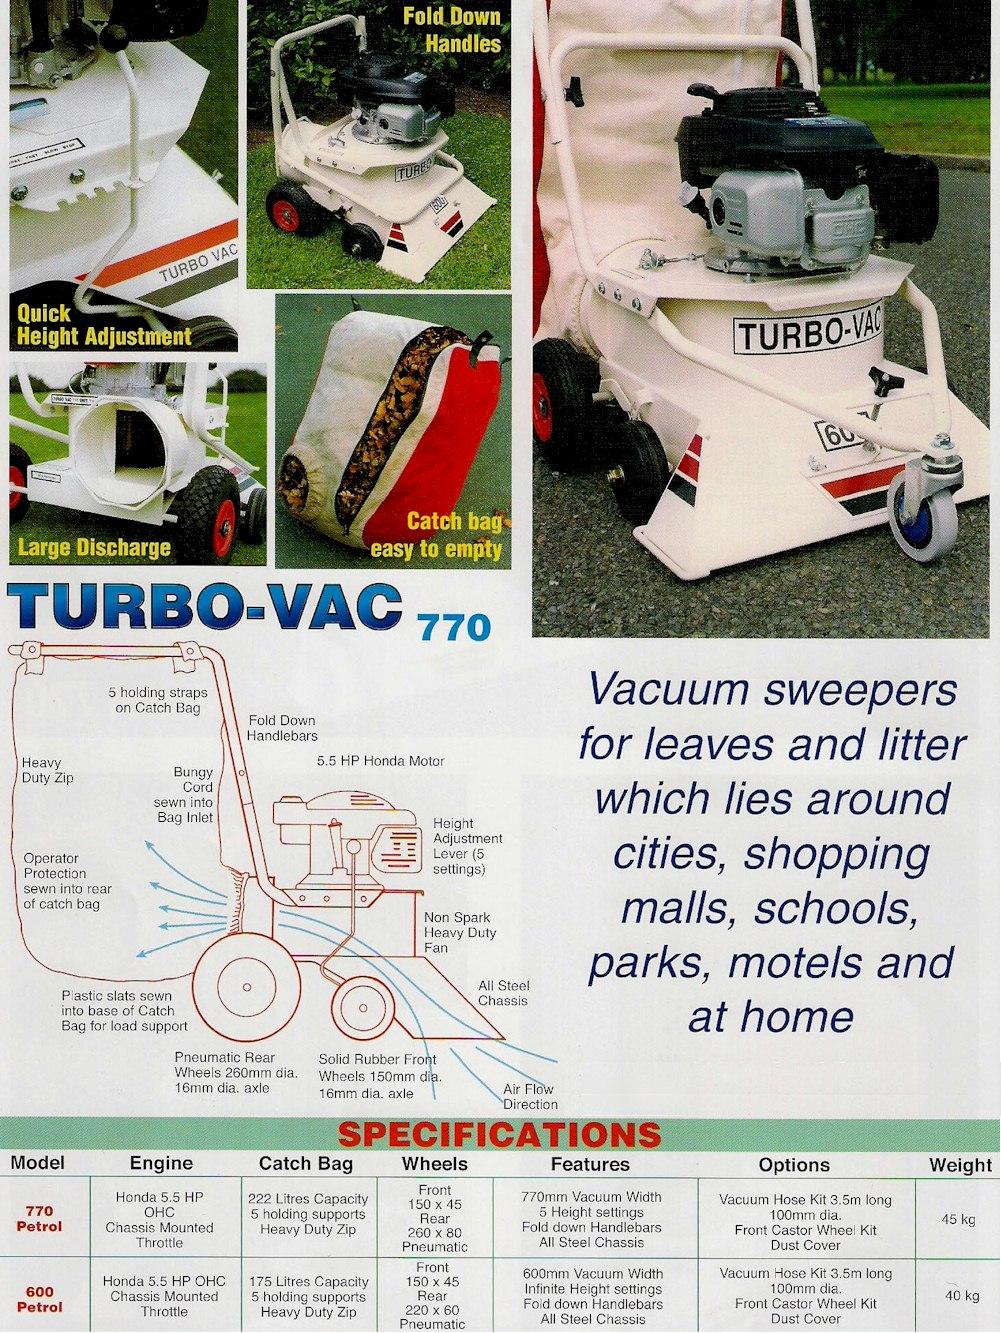 Turbovac 600 & 770